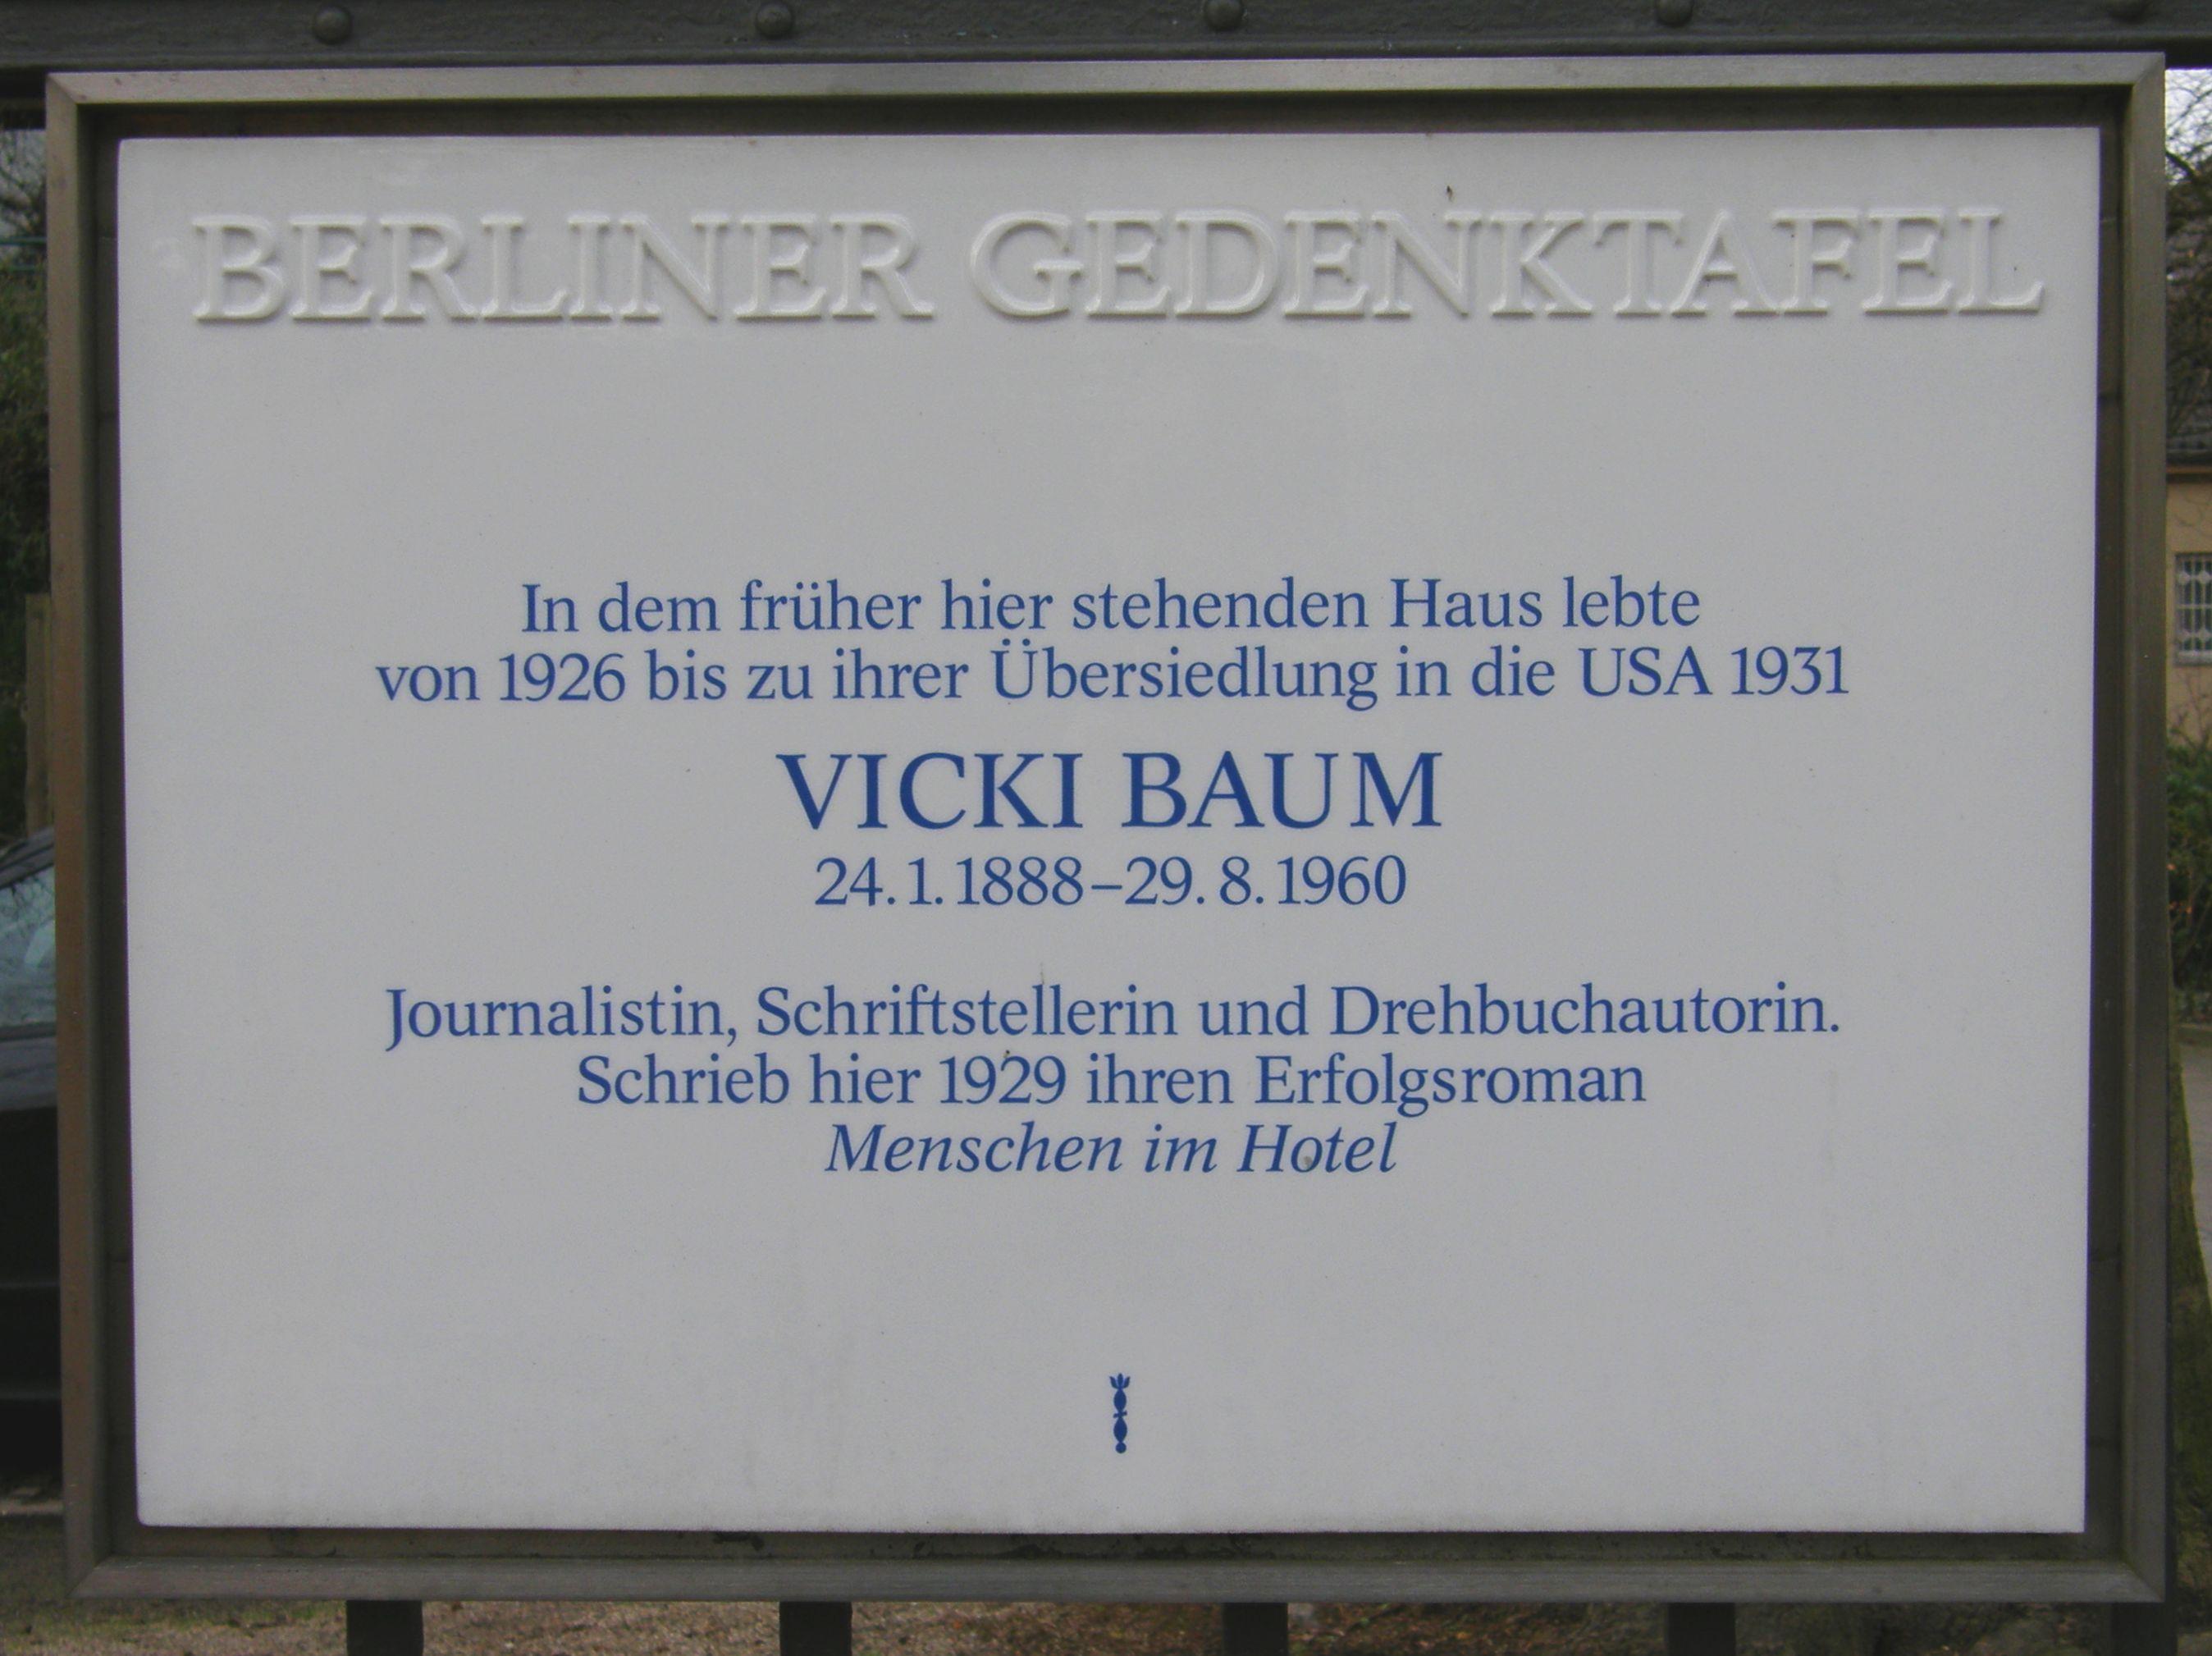 Gedenktafel Vicki Baum, 1929.